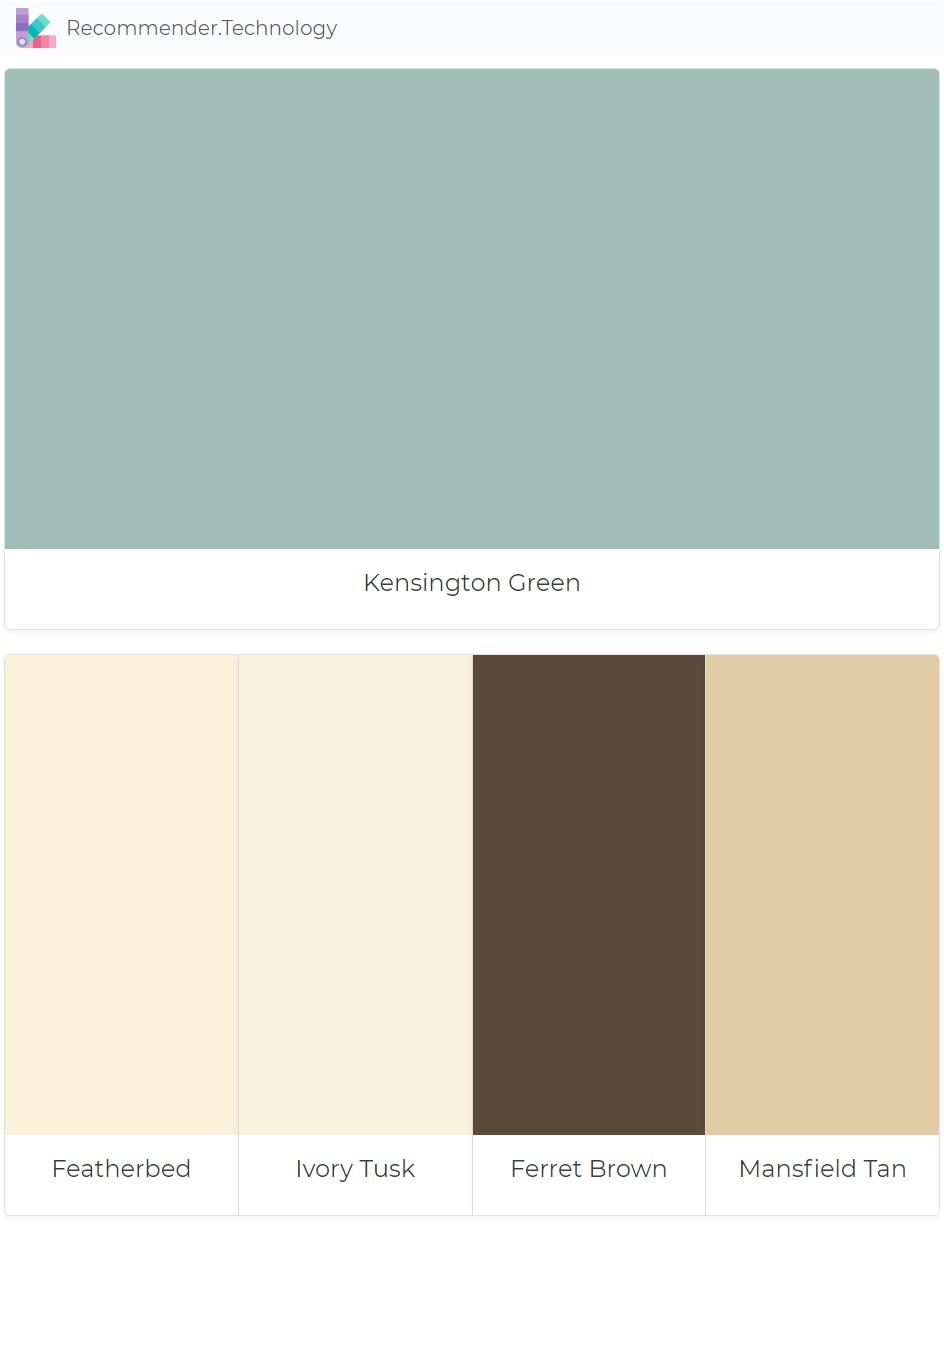 kensington green featherbed ivory tusk ferret brown mansfield tan